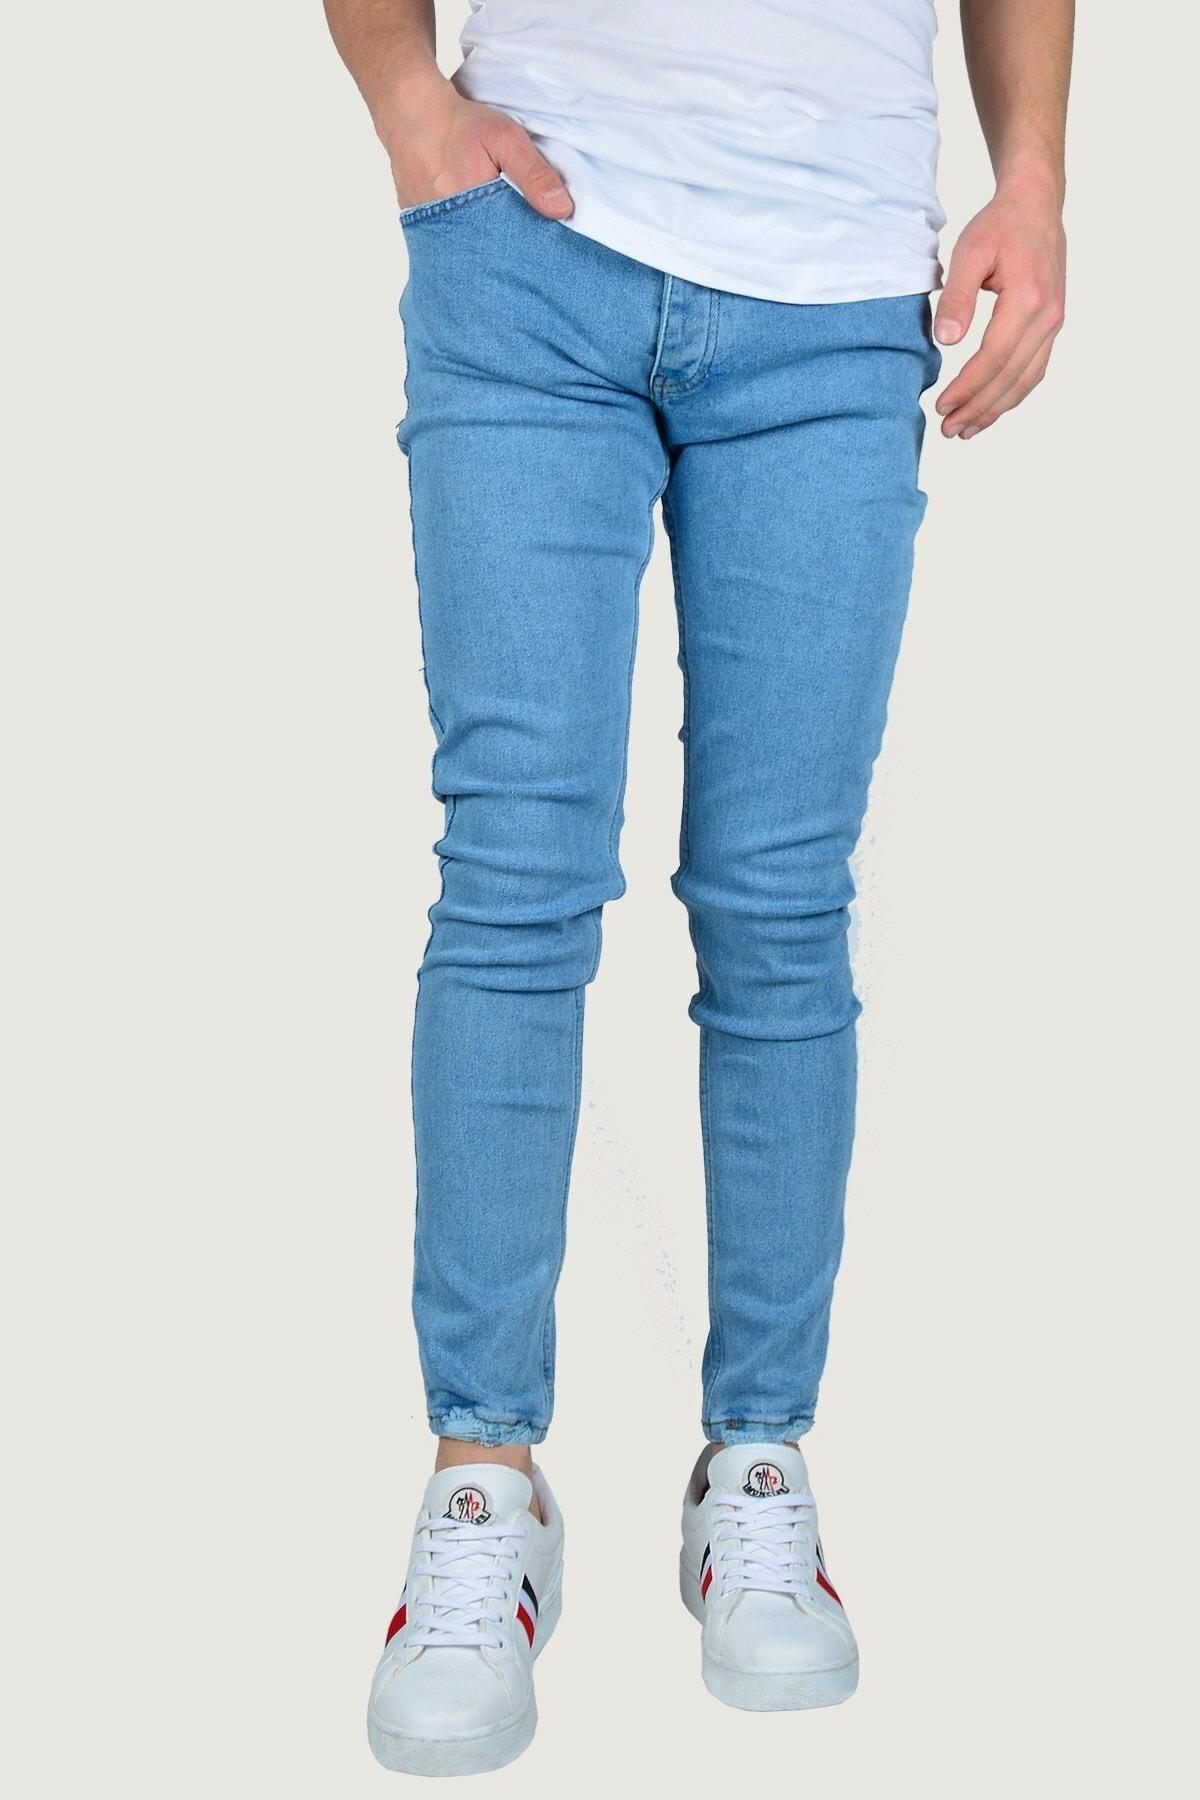 Terapi Men Erkek Kot Pantolon 8K-2100306-004-1 Buz Mavisi 3